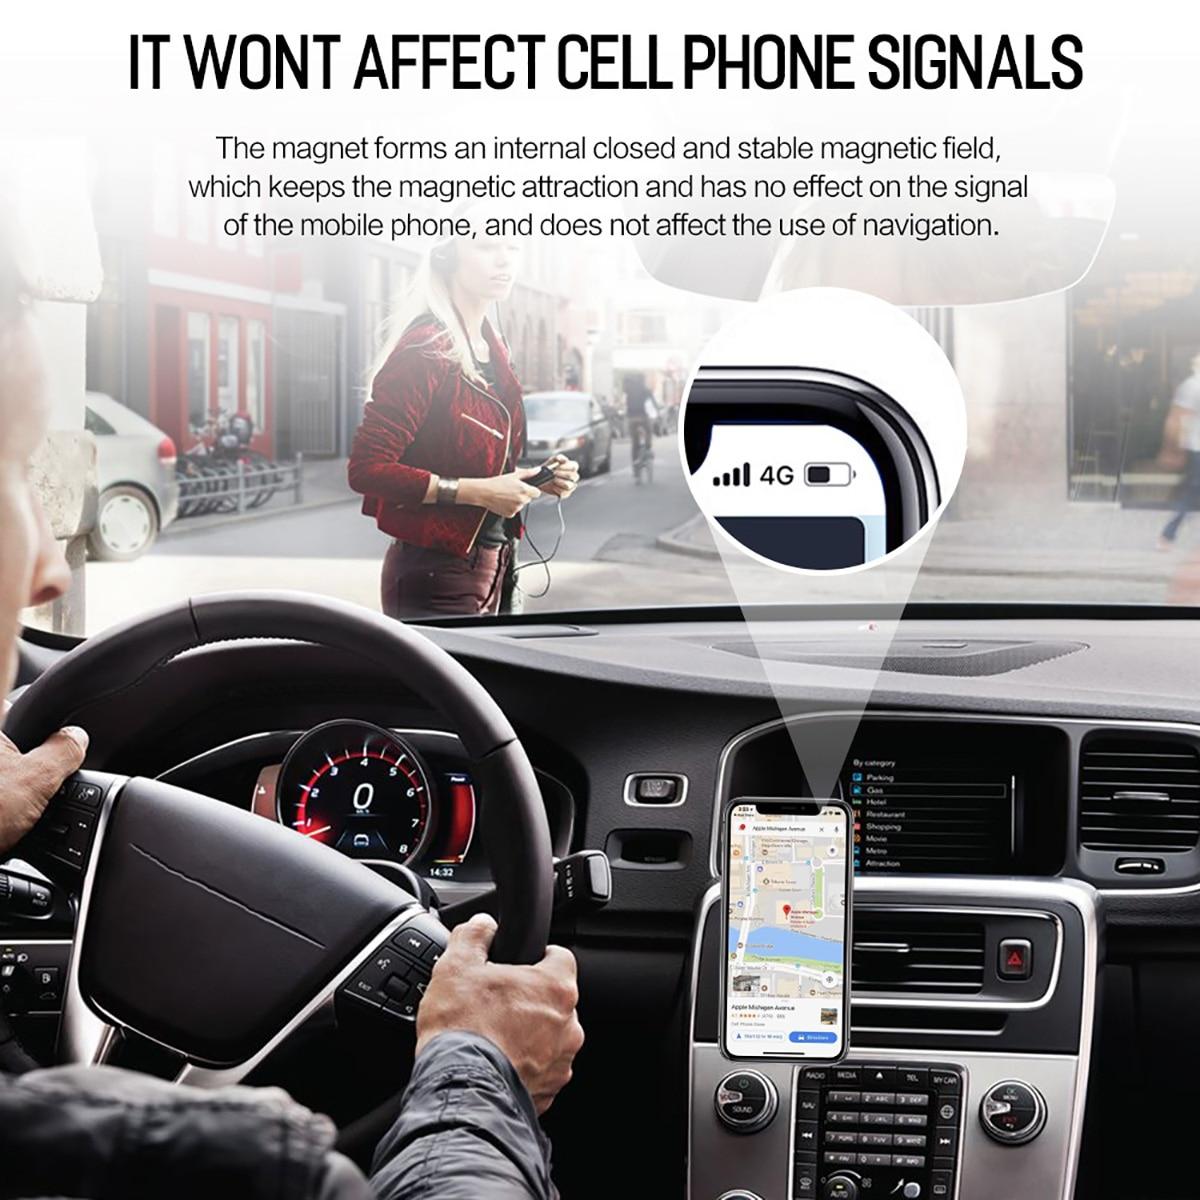 HTB1DmgUX2WG3KVjSZPcq6zkbXXaD - Minimalist Magnetic Car Phone Holder